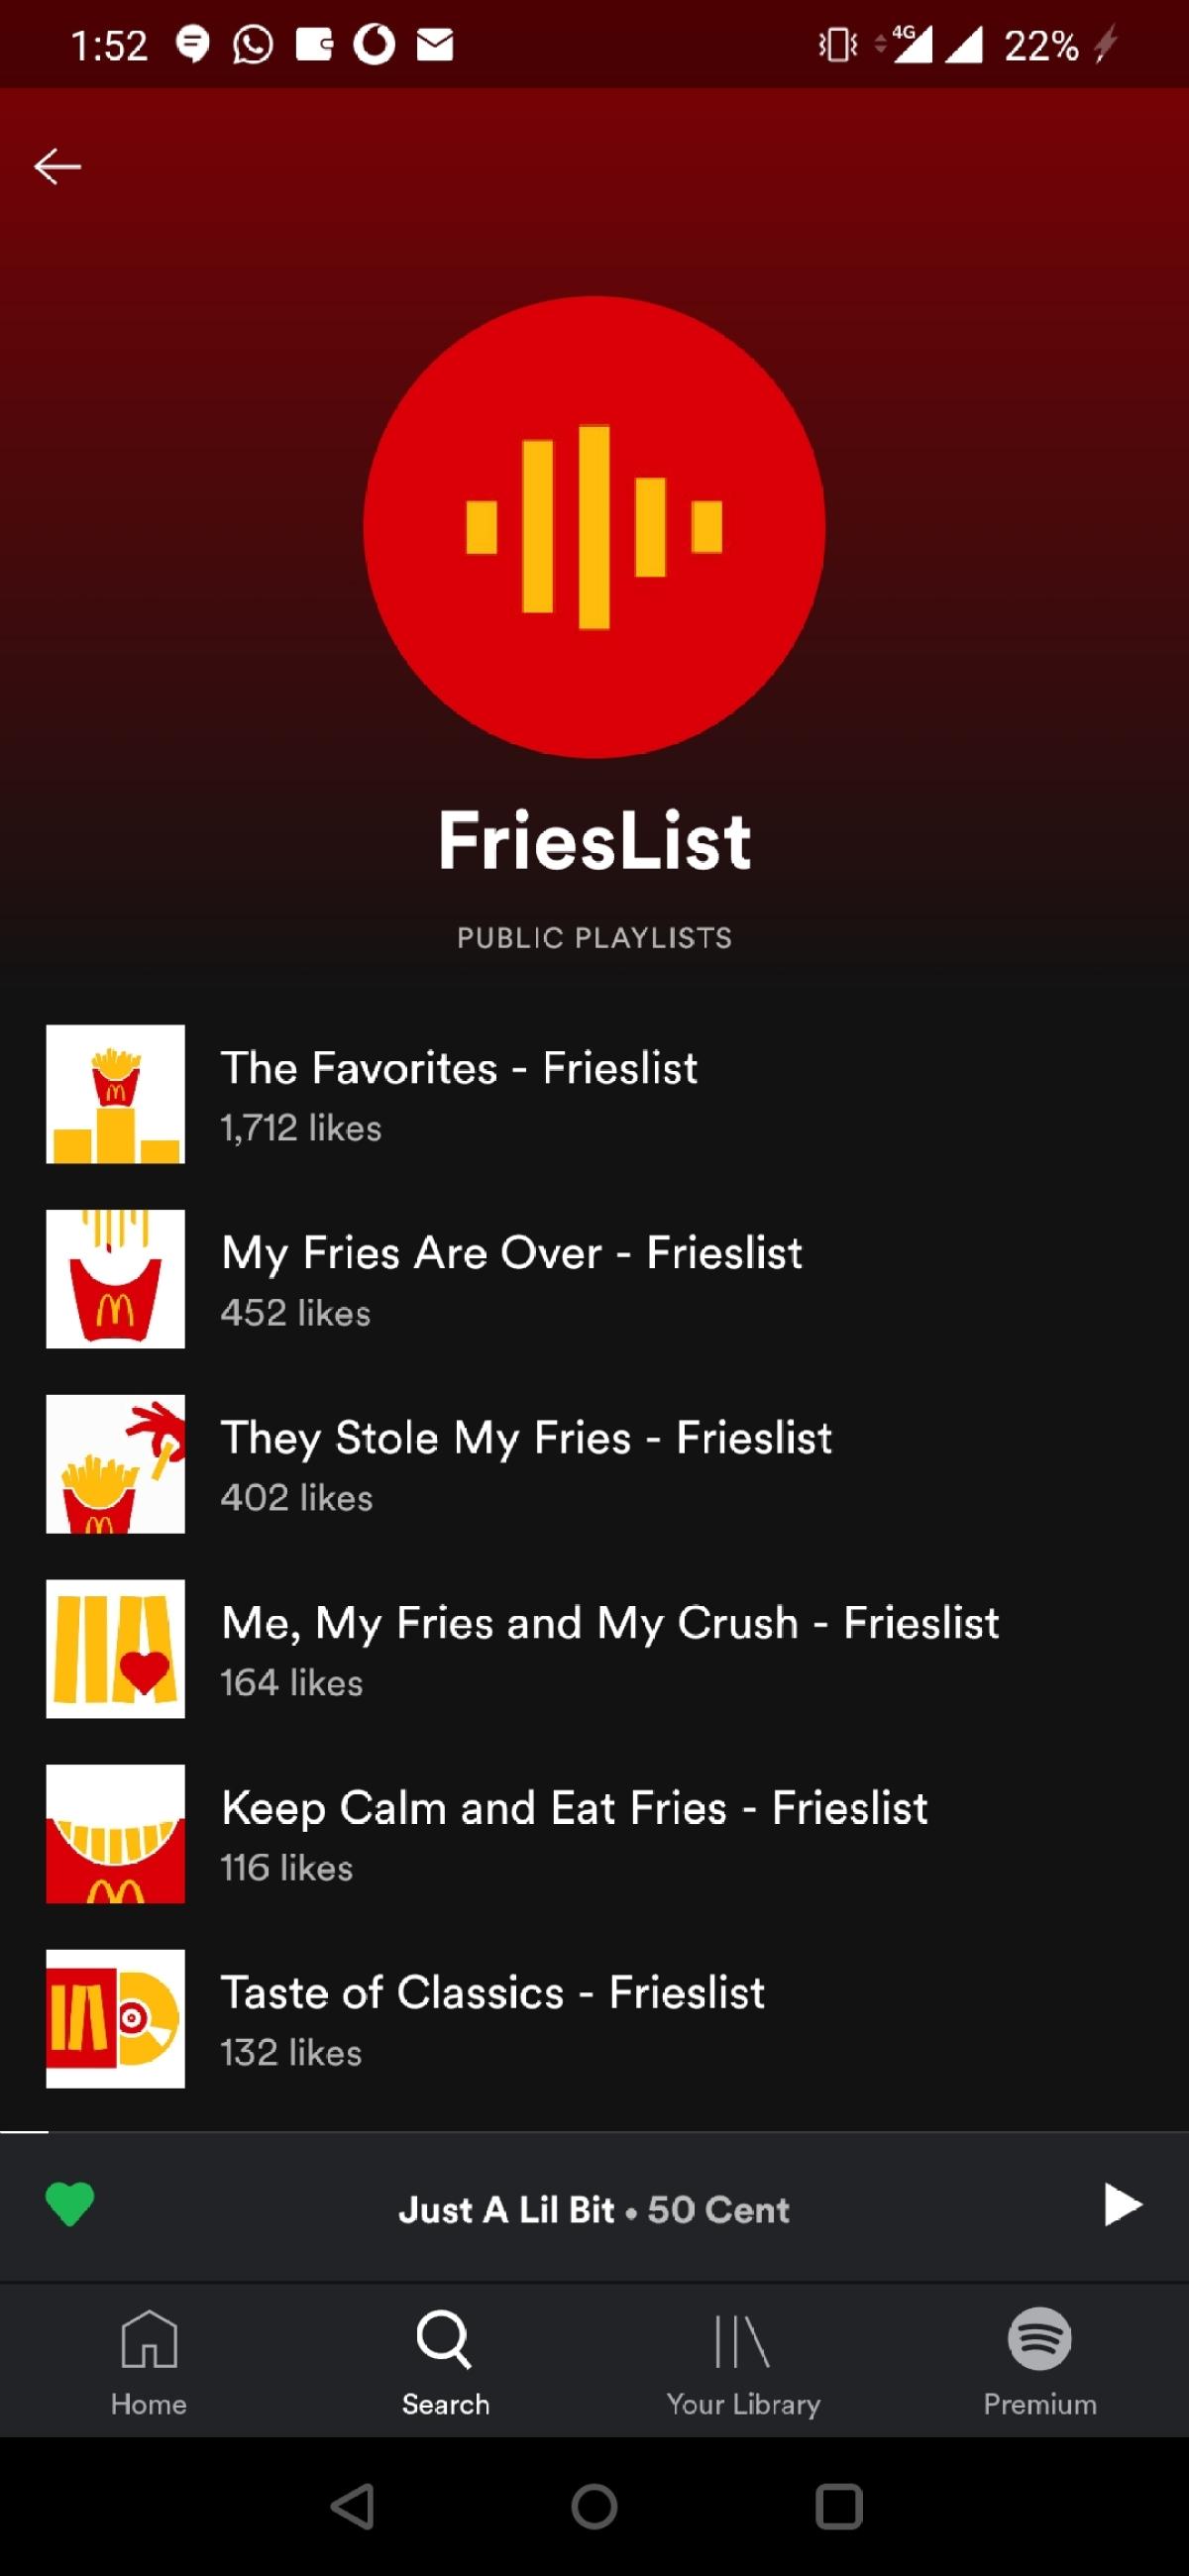 Spotify's 'fries' themed playlists